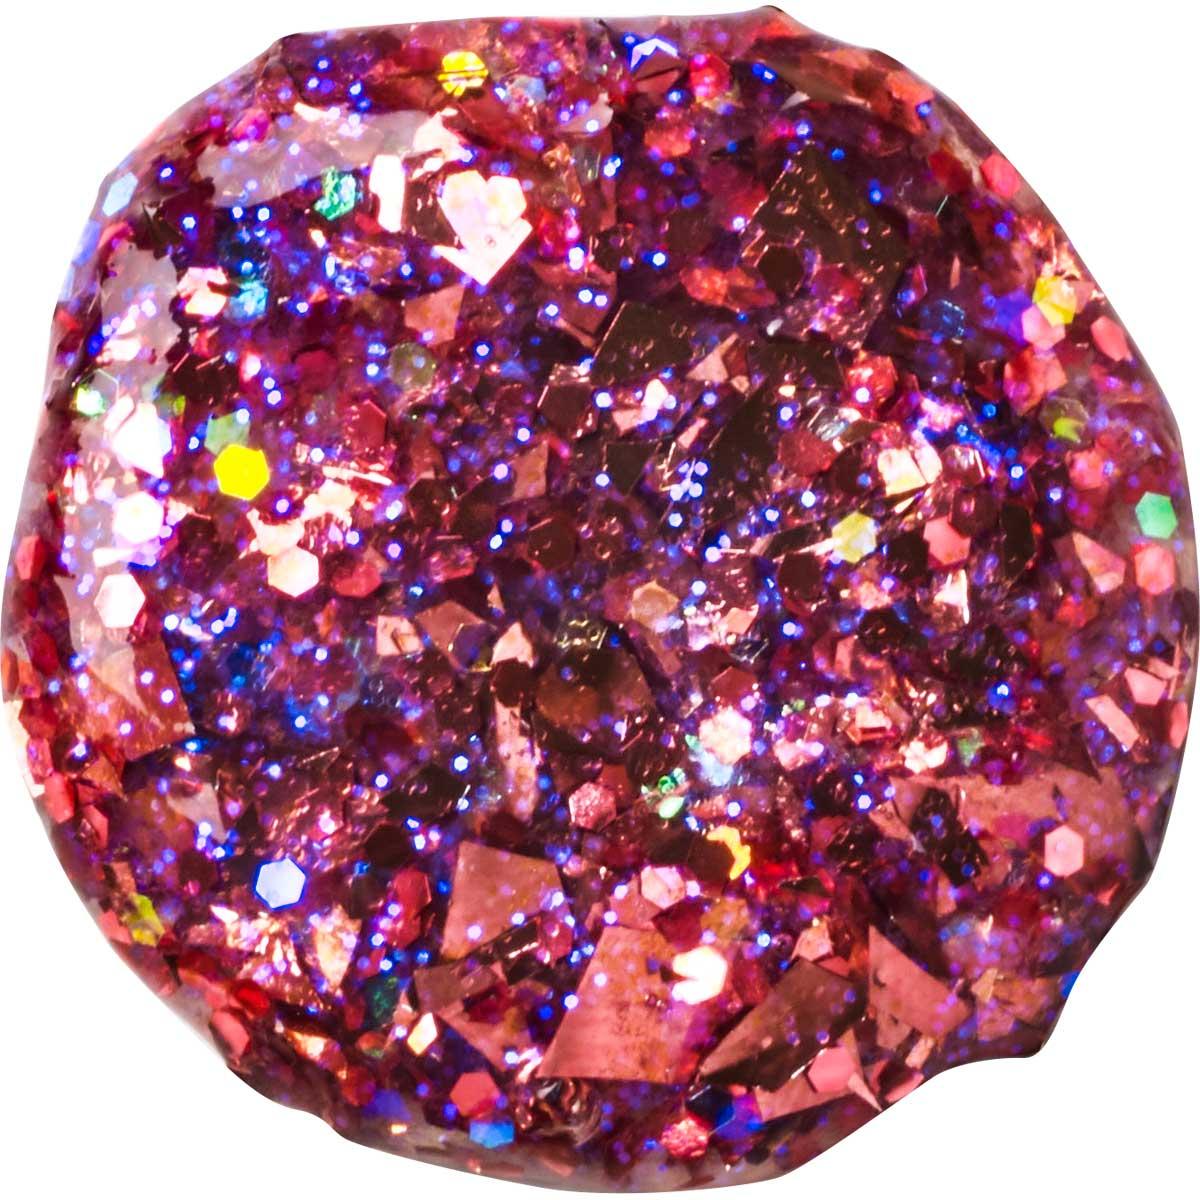 FolkArt ® Glitterific™ Acrylic Paint - Hot Pink, 2 oz.